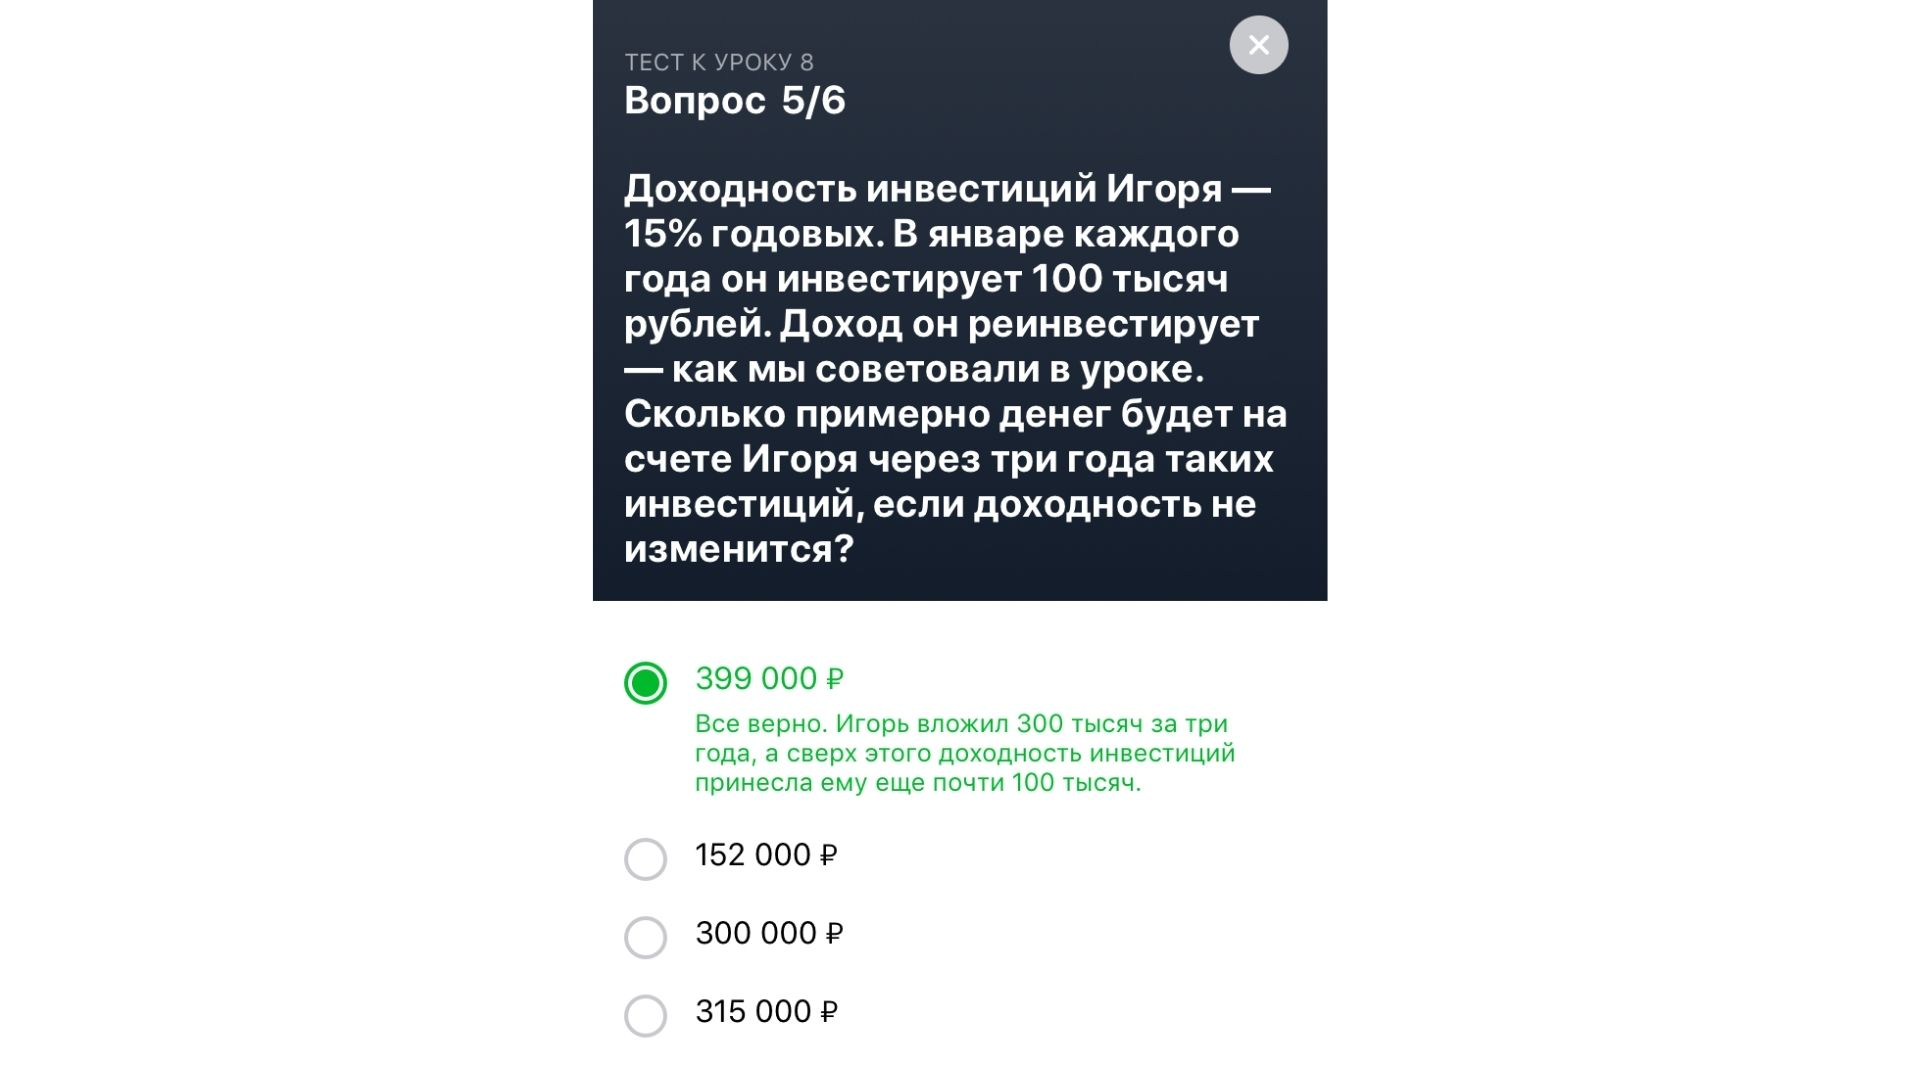 Тинькофф Инвестиции Ответы на тест Урок 8